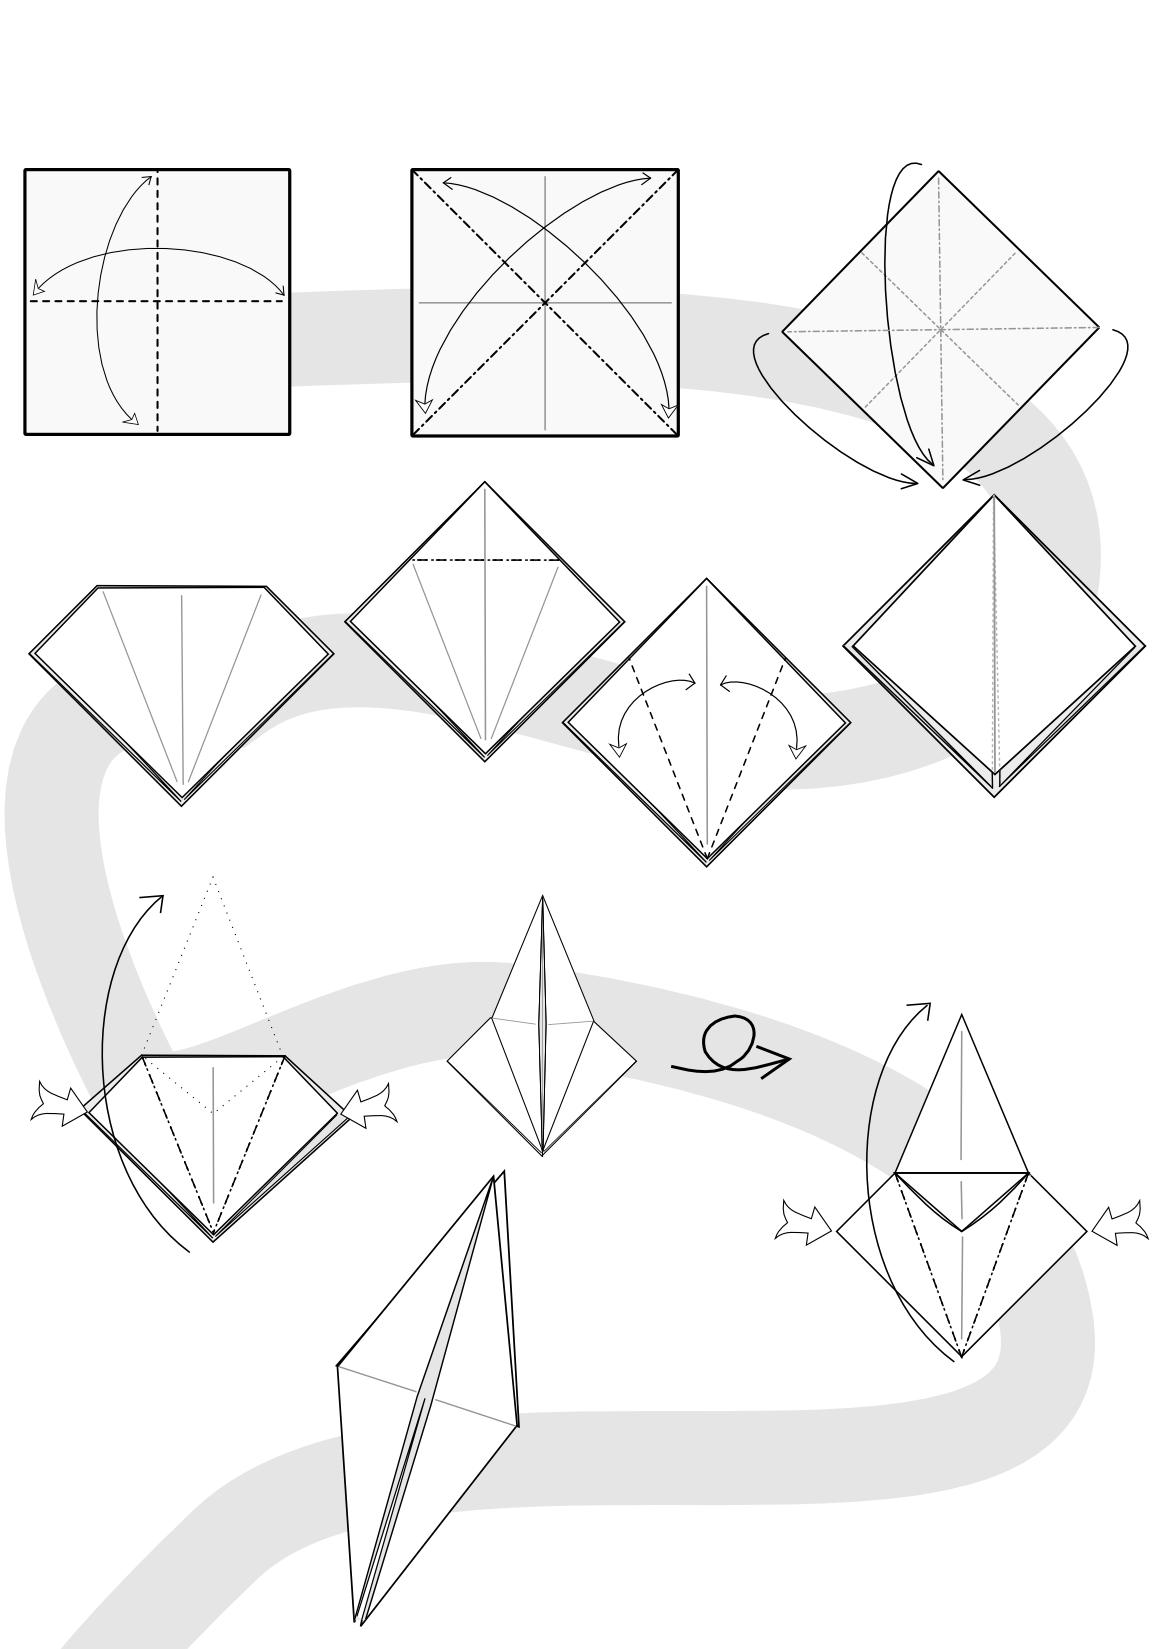 Origami Werewolf Diagram - photo#45